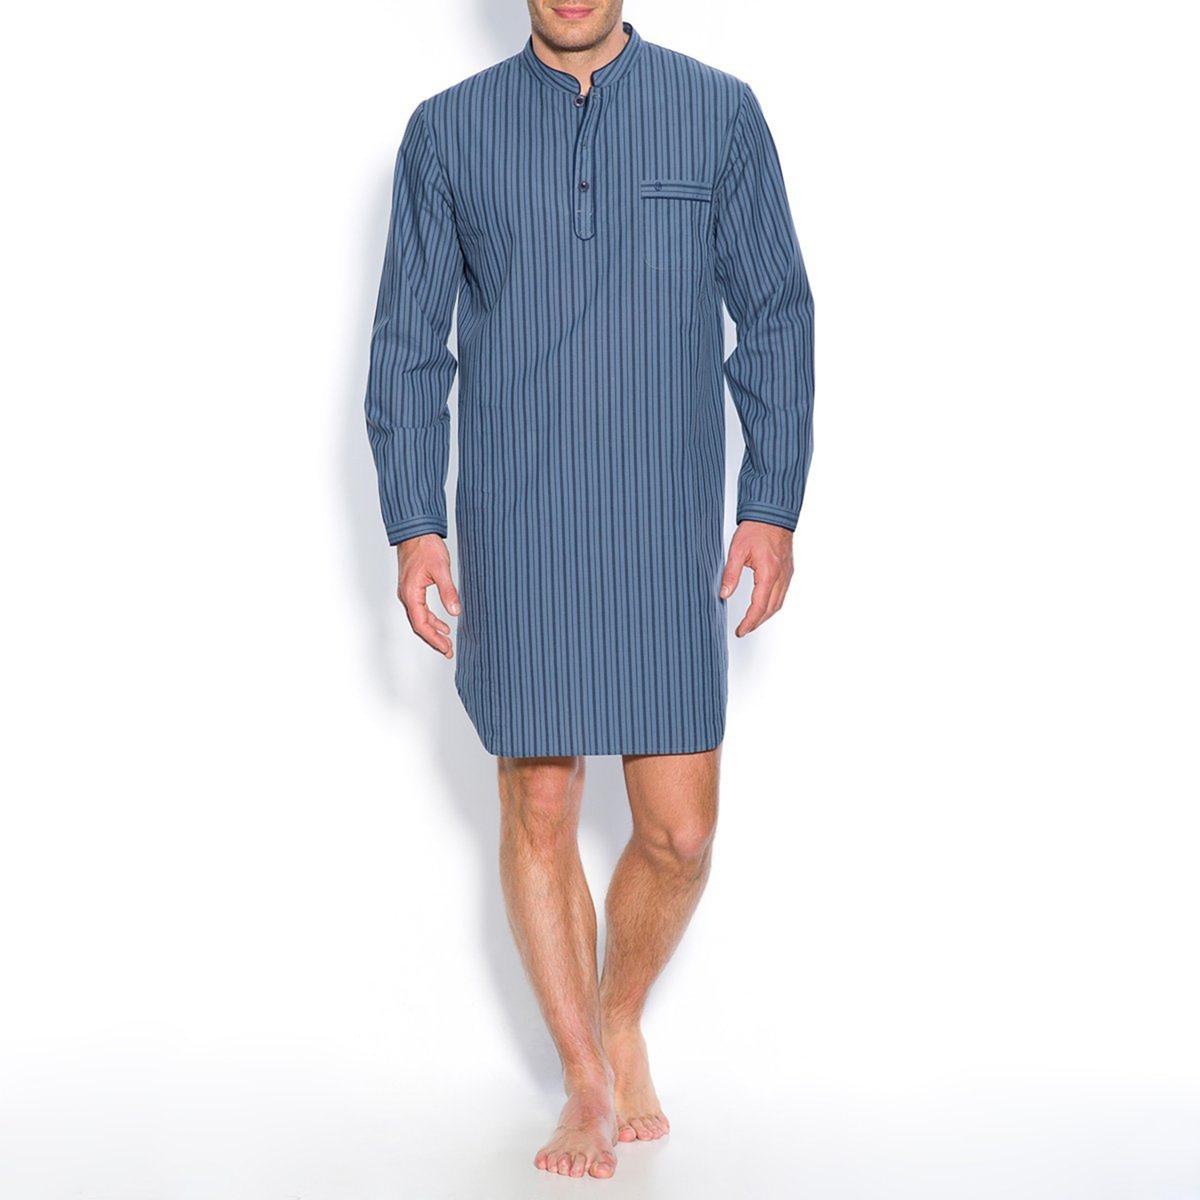 Пижама-рубашка в полоску из поплина от La Redoute